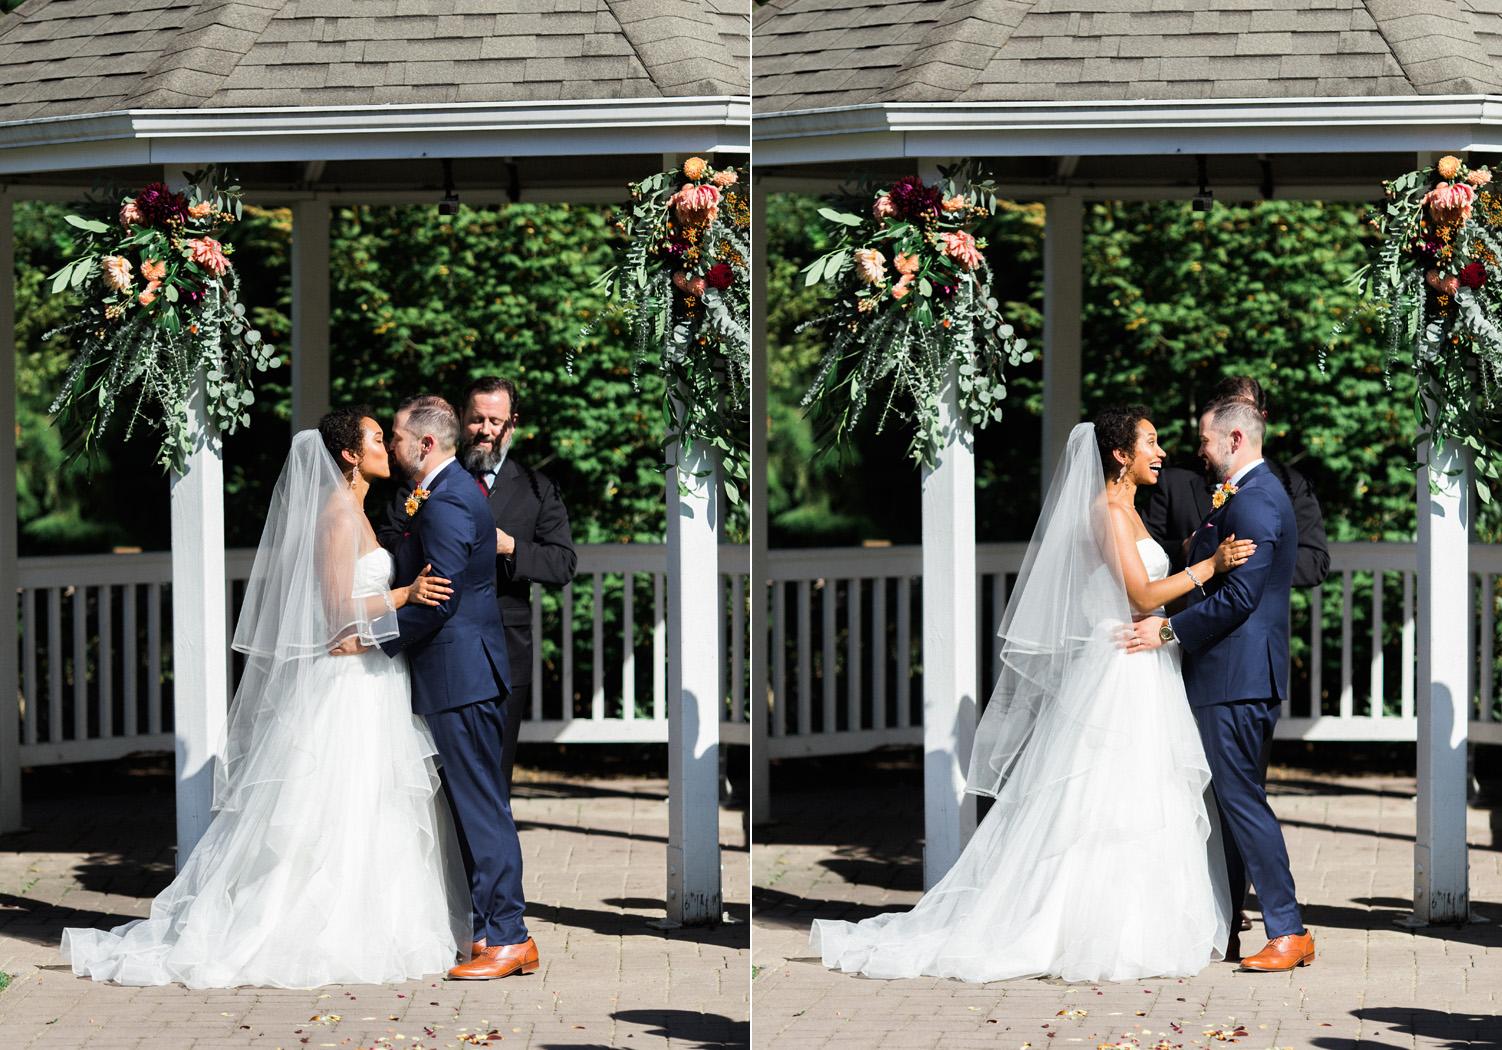 Pickering Barn Outdoor Issaquah Seattle Wedding Photography.jpg